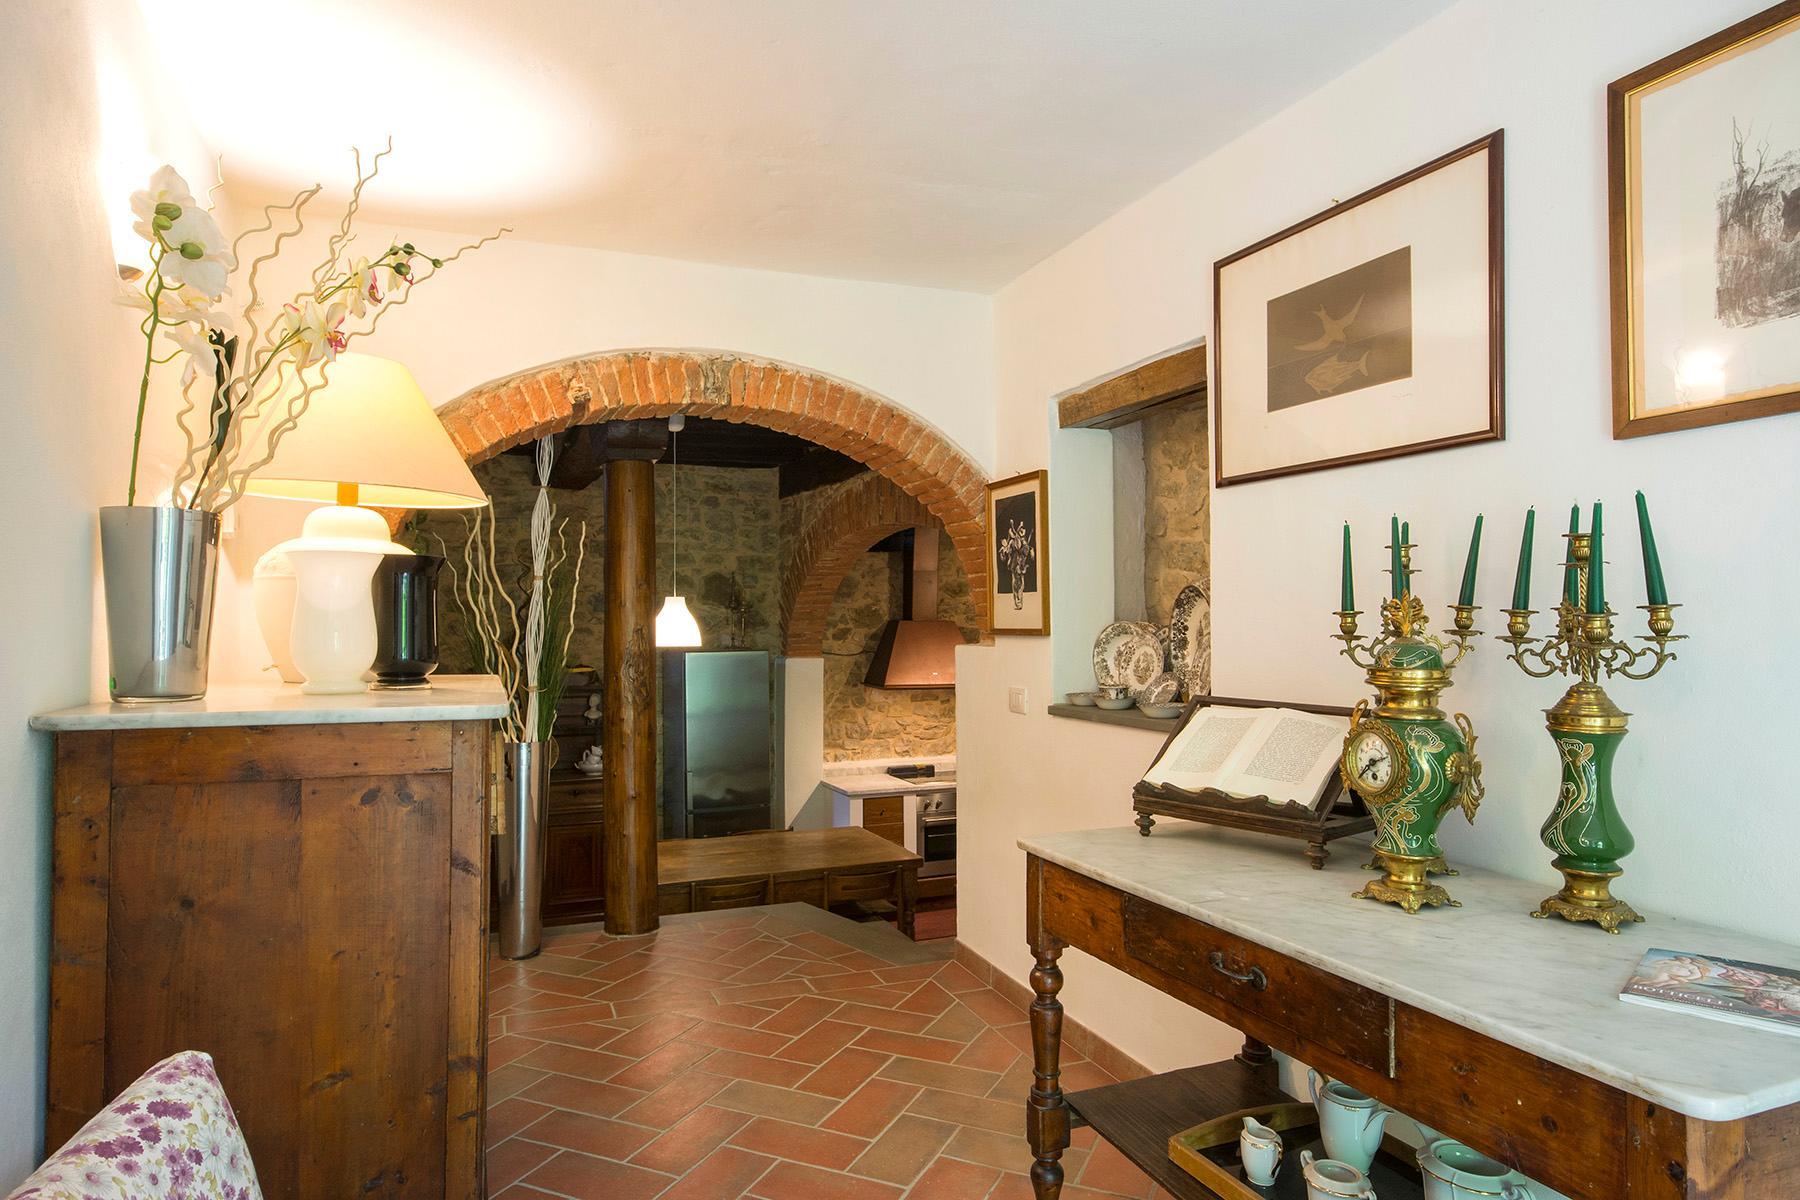 Villa charmante dans dans la Val di Sieve - 21